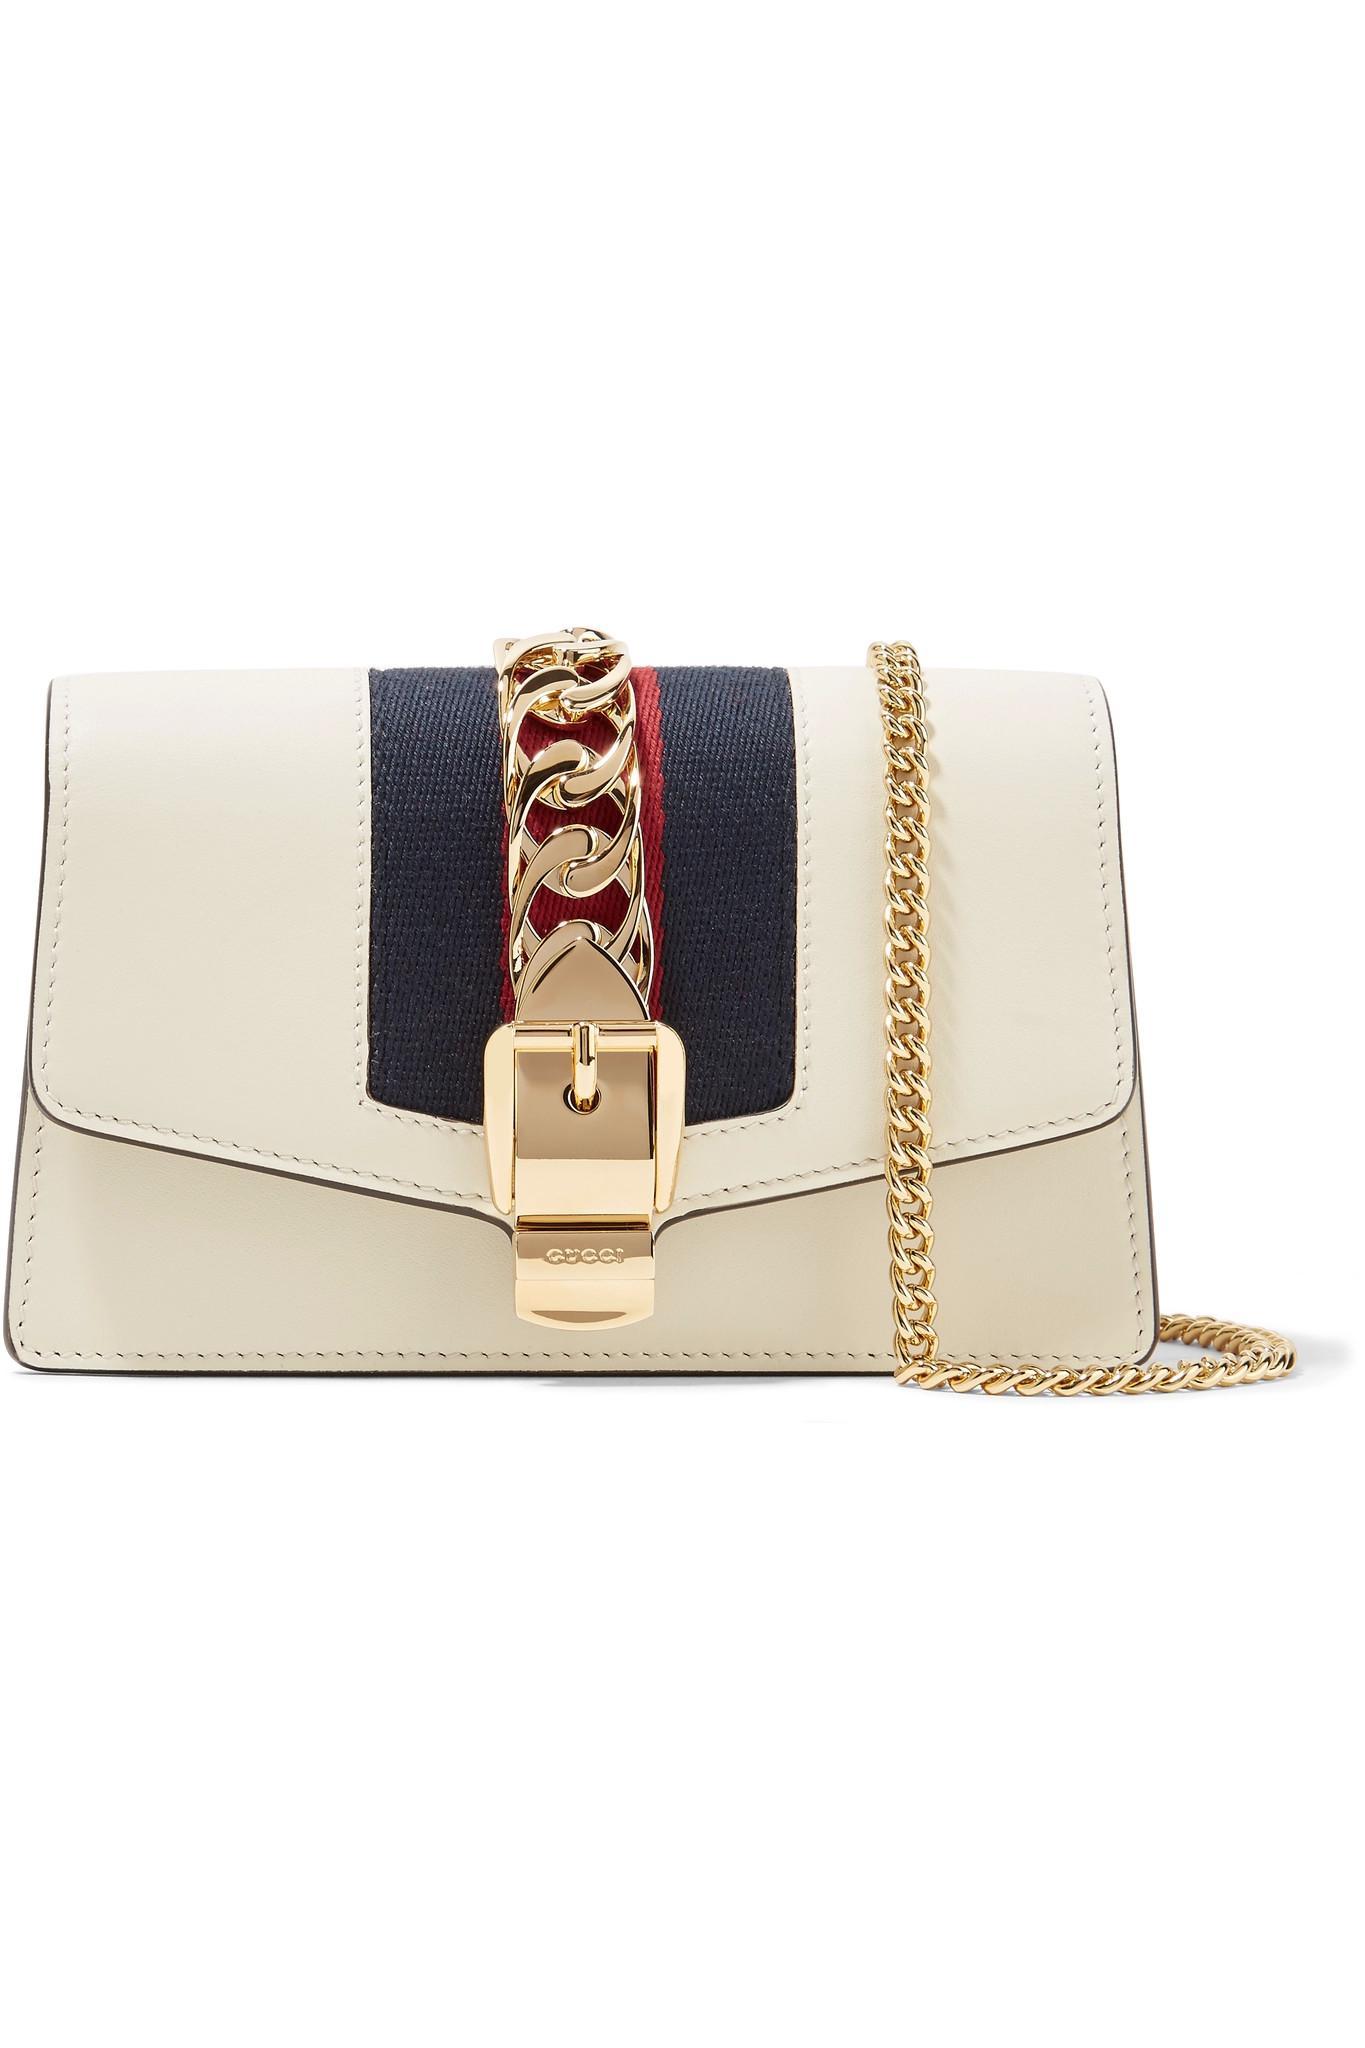 Sylvie Mini Chain-embellished Leather Shoulder Bag - White Gucci 5vbH3q0A4